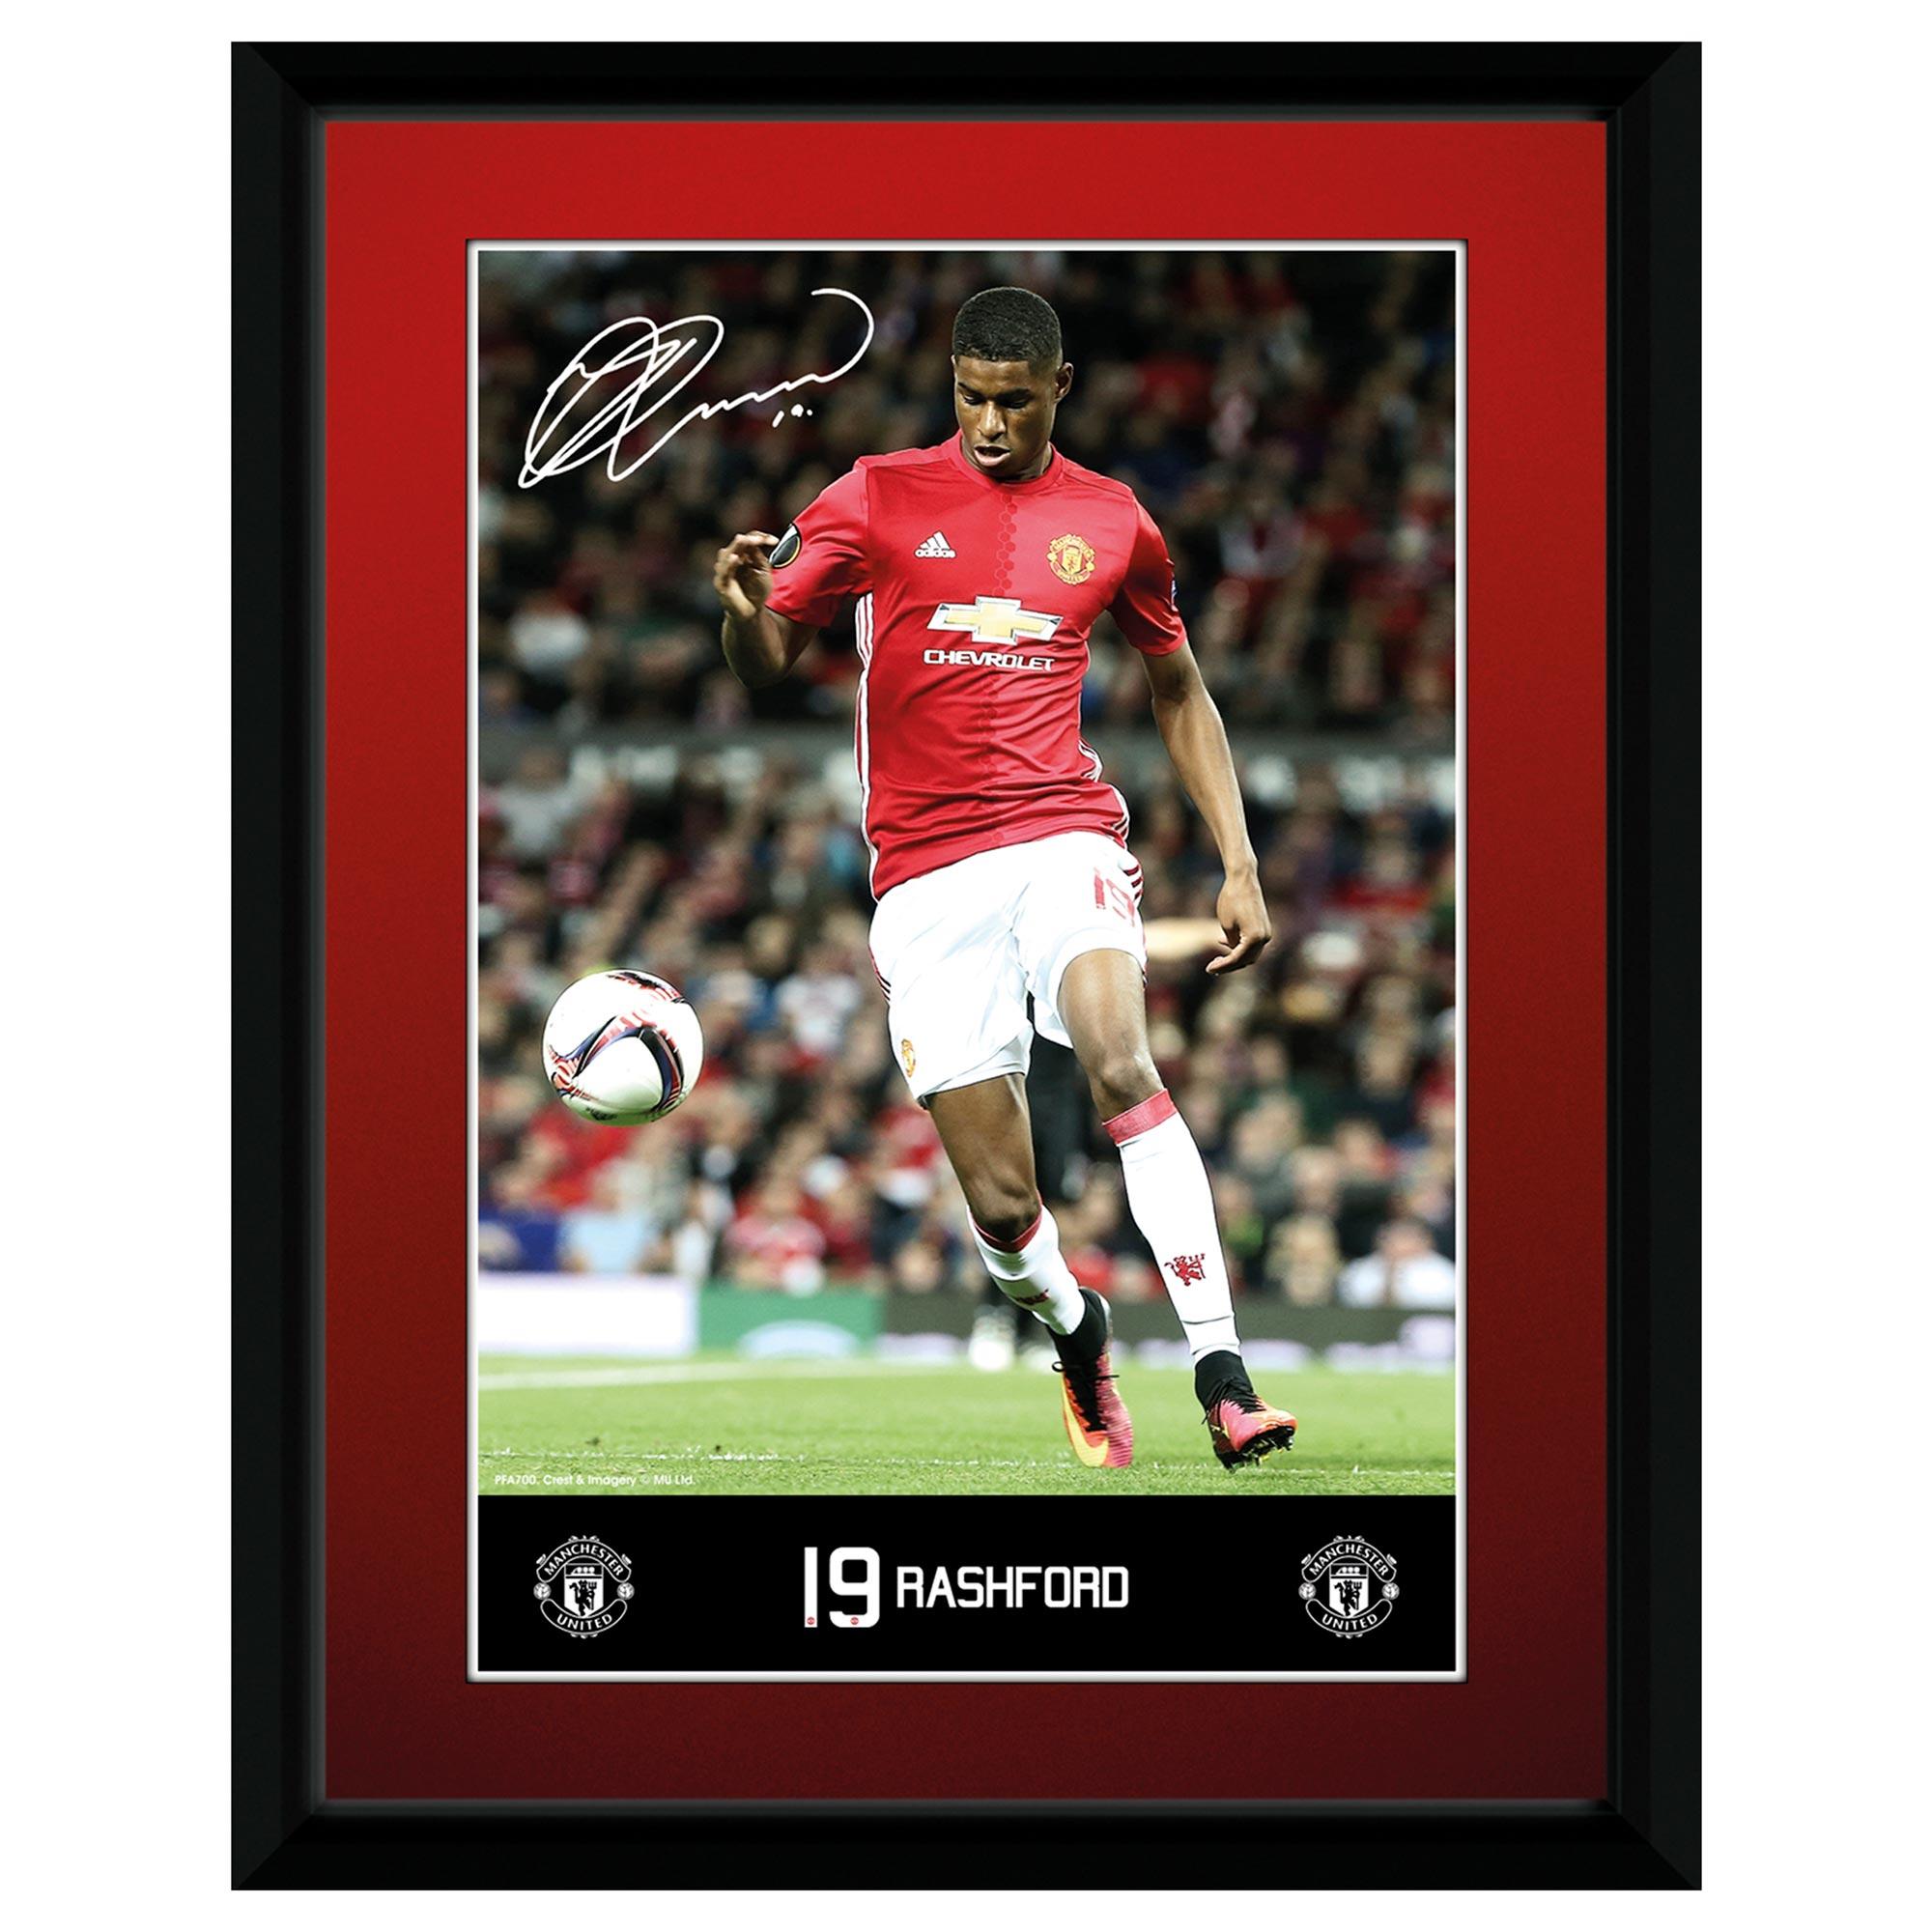 Manchester United 16-17 Rashford Framed Print 8 x 6